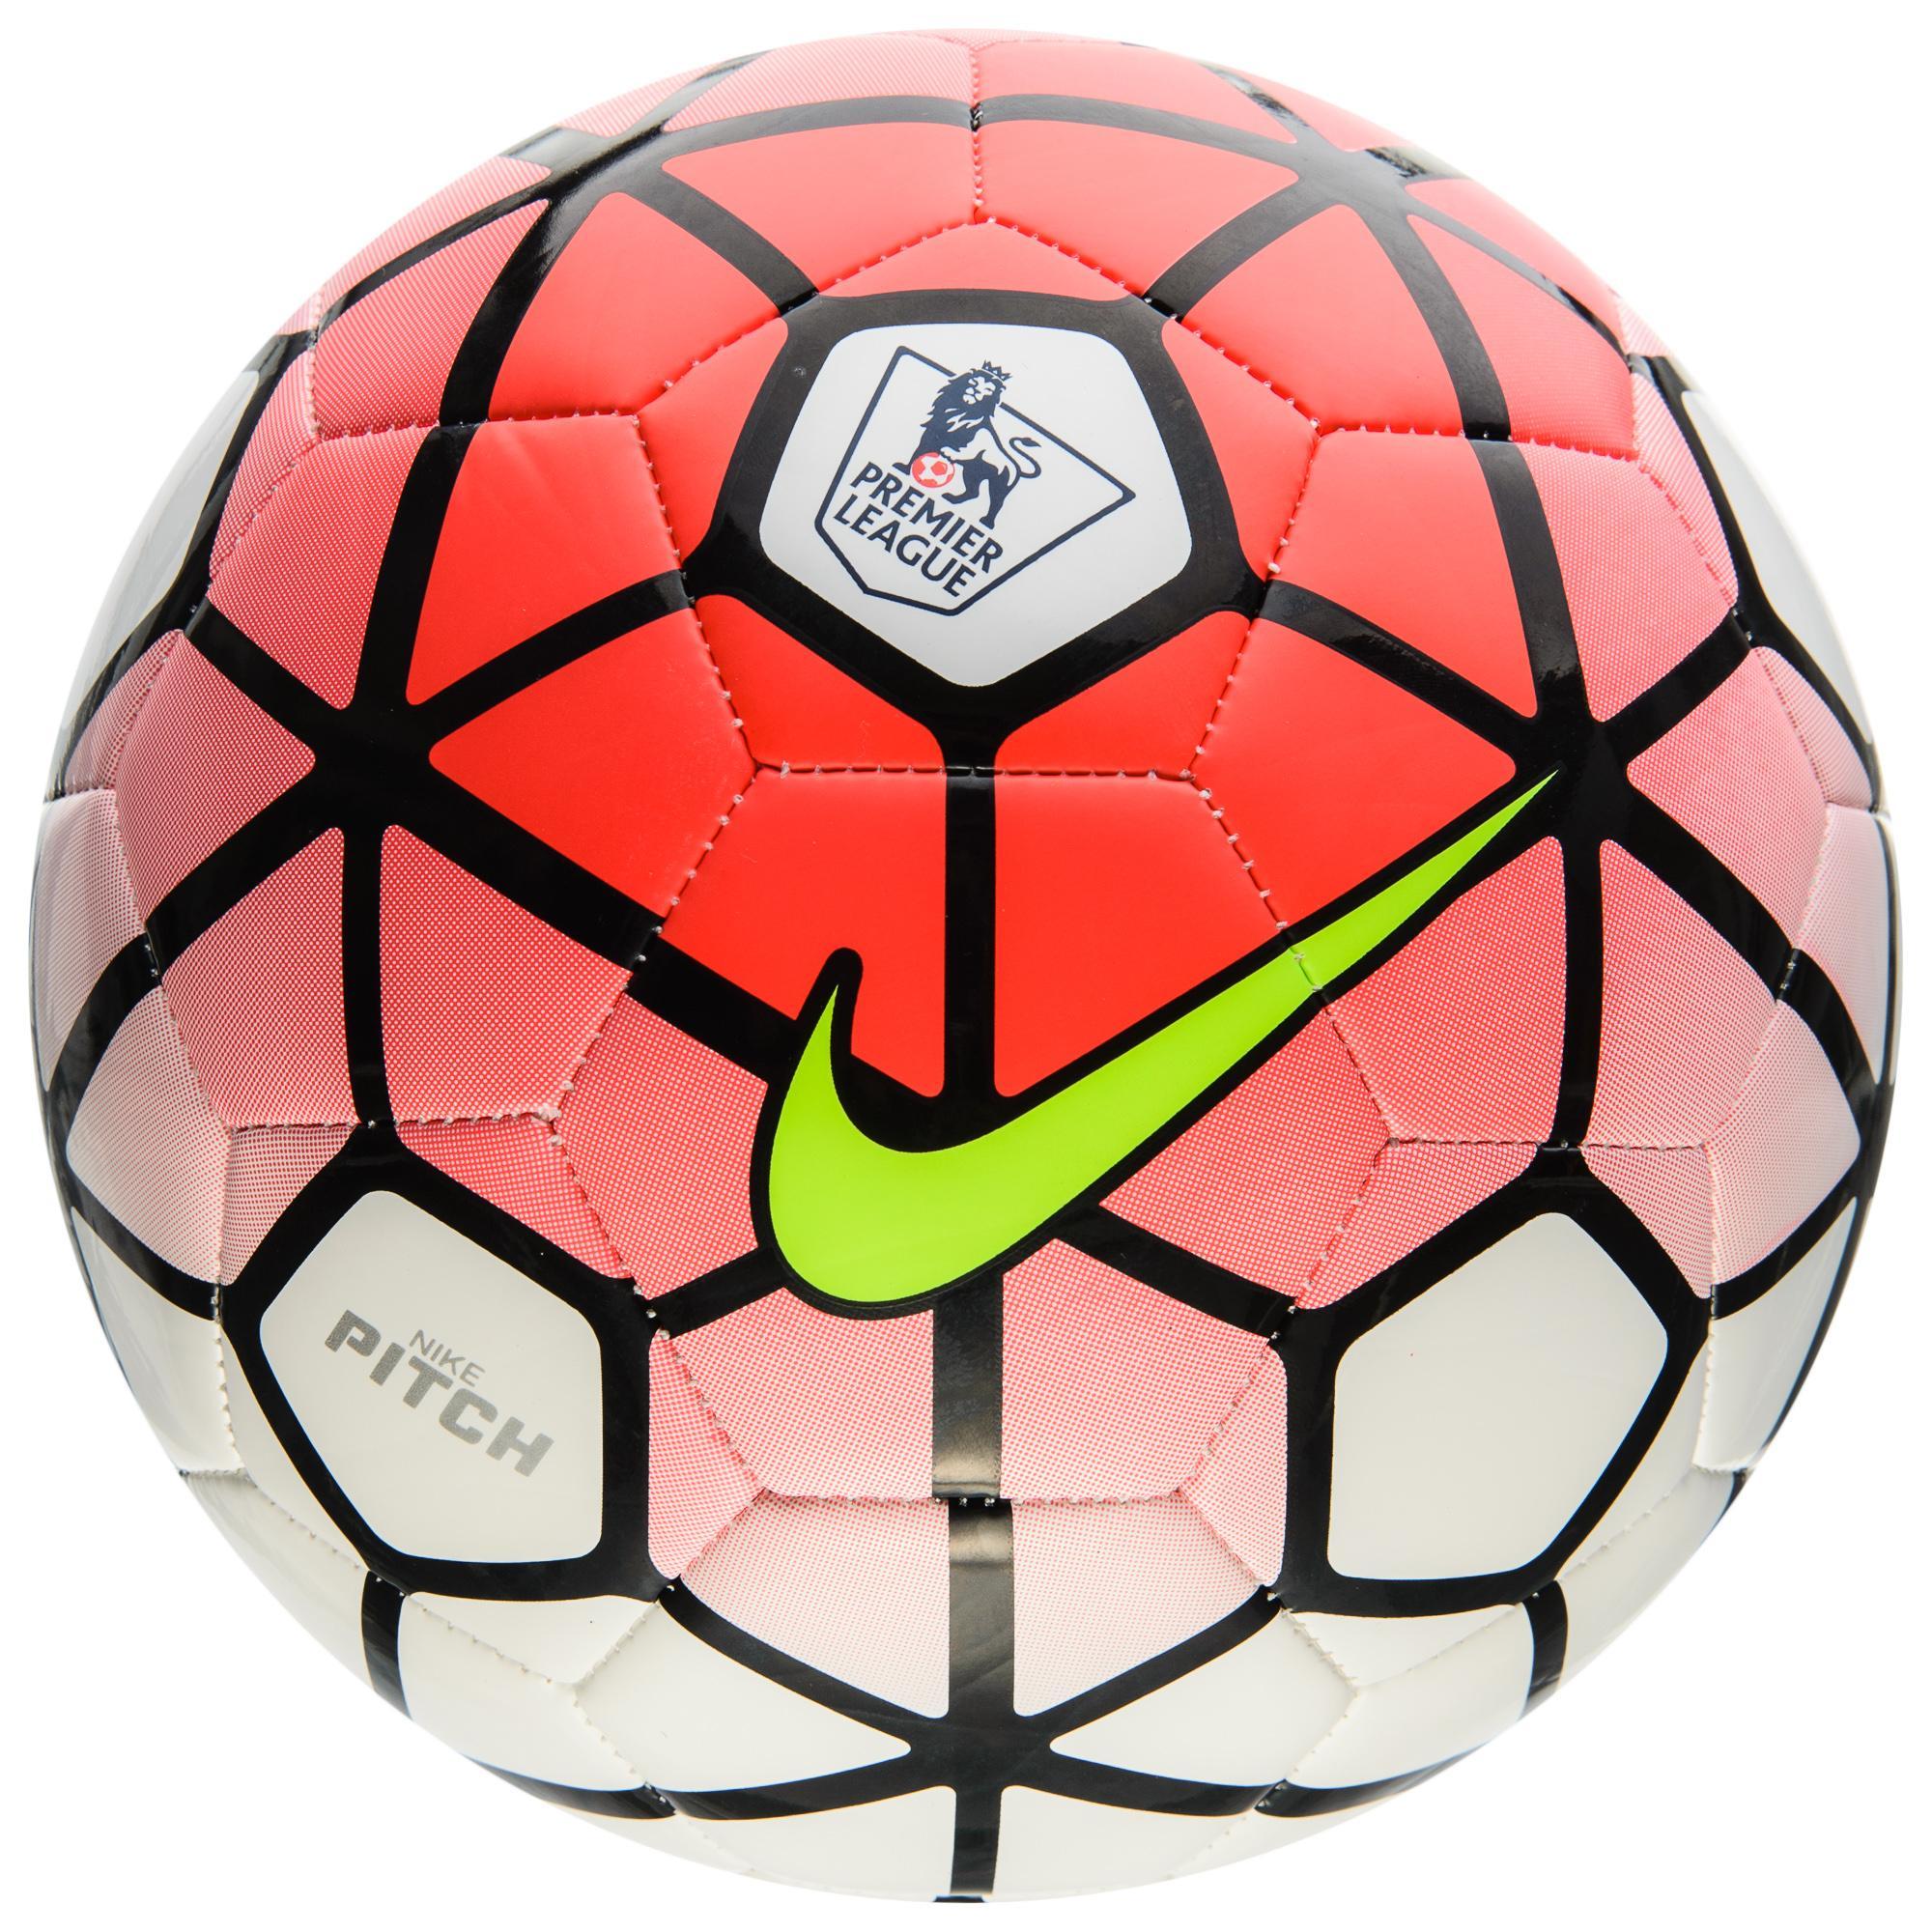 Nike Fotboll Pitch EPL Premier League Röd/Vit/Svart